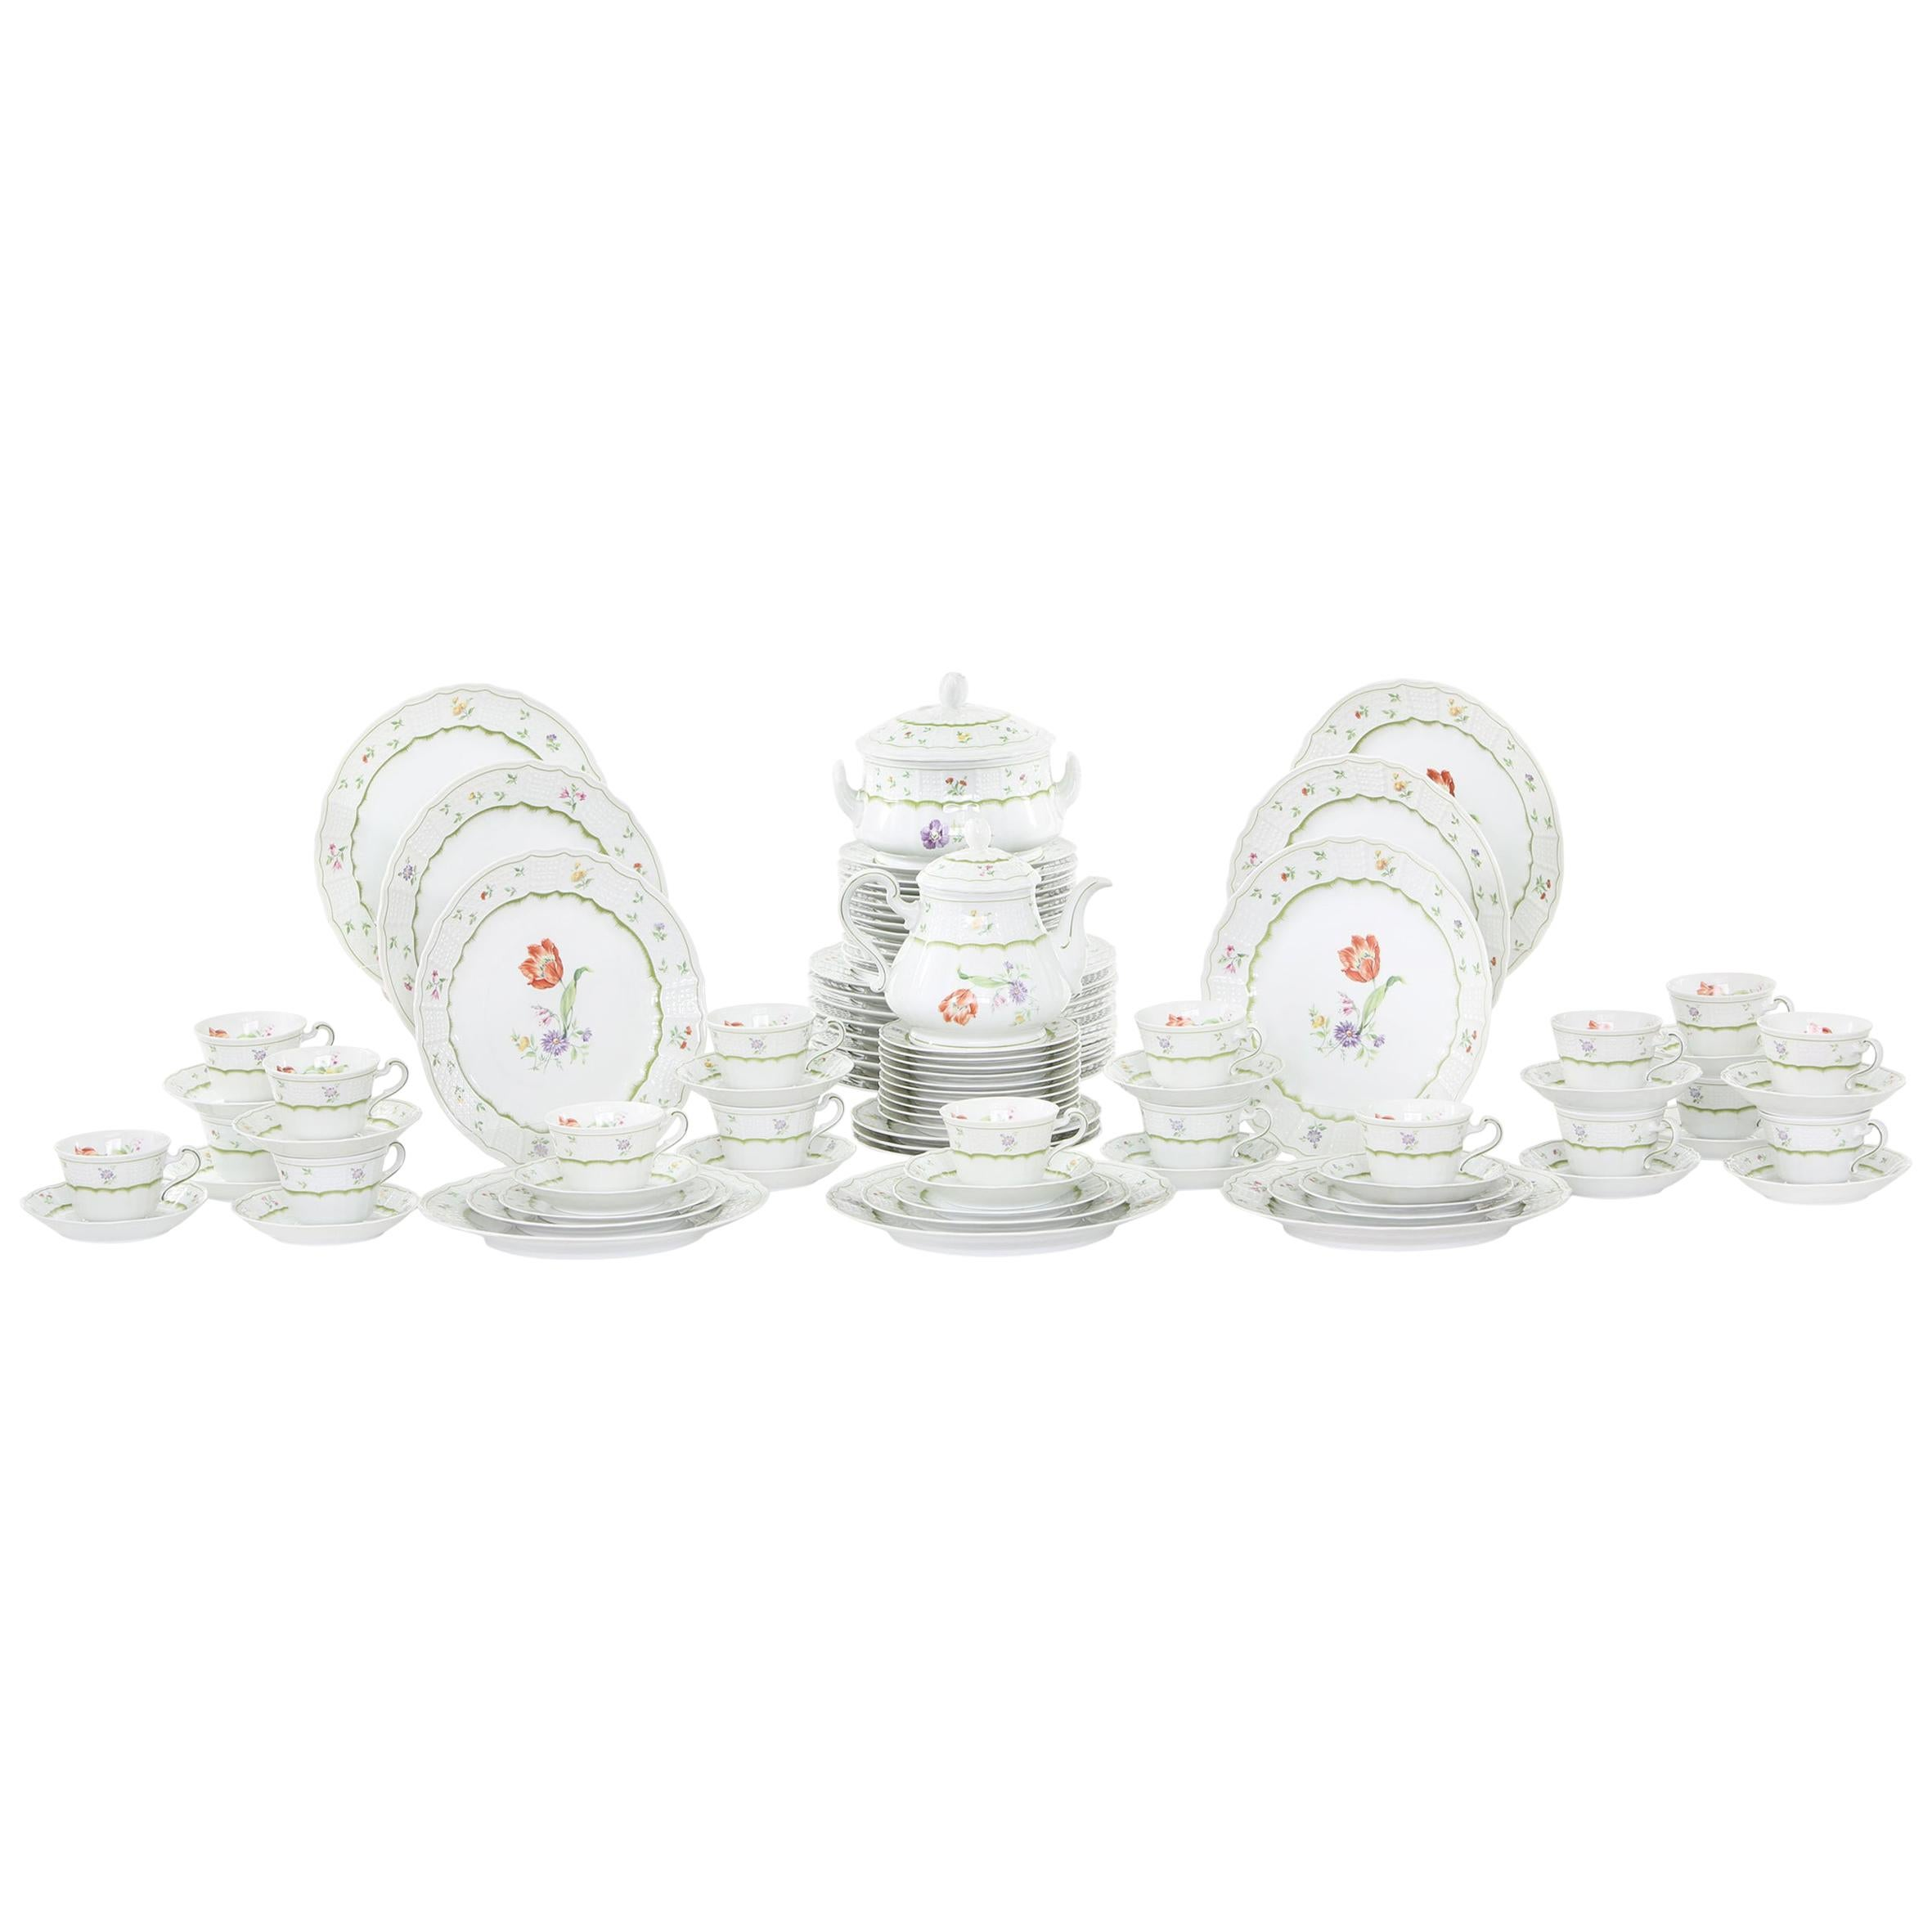 German Porcelain Dinner Service For Eighteen People